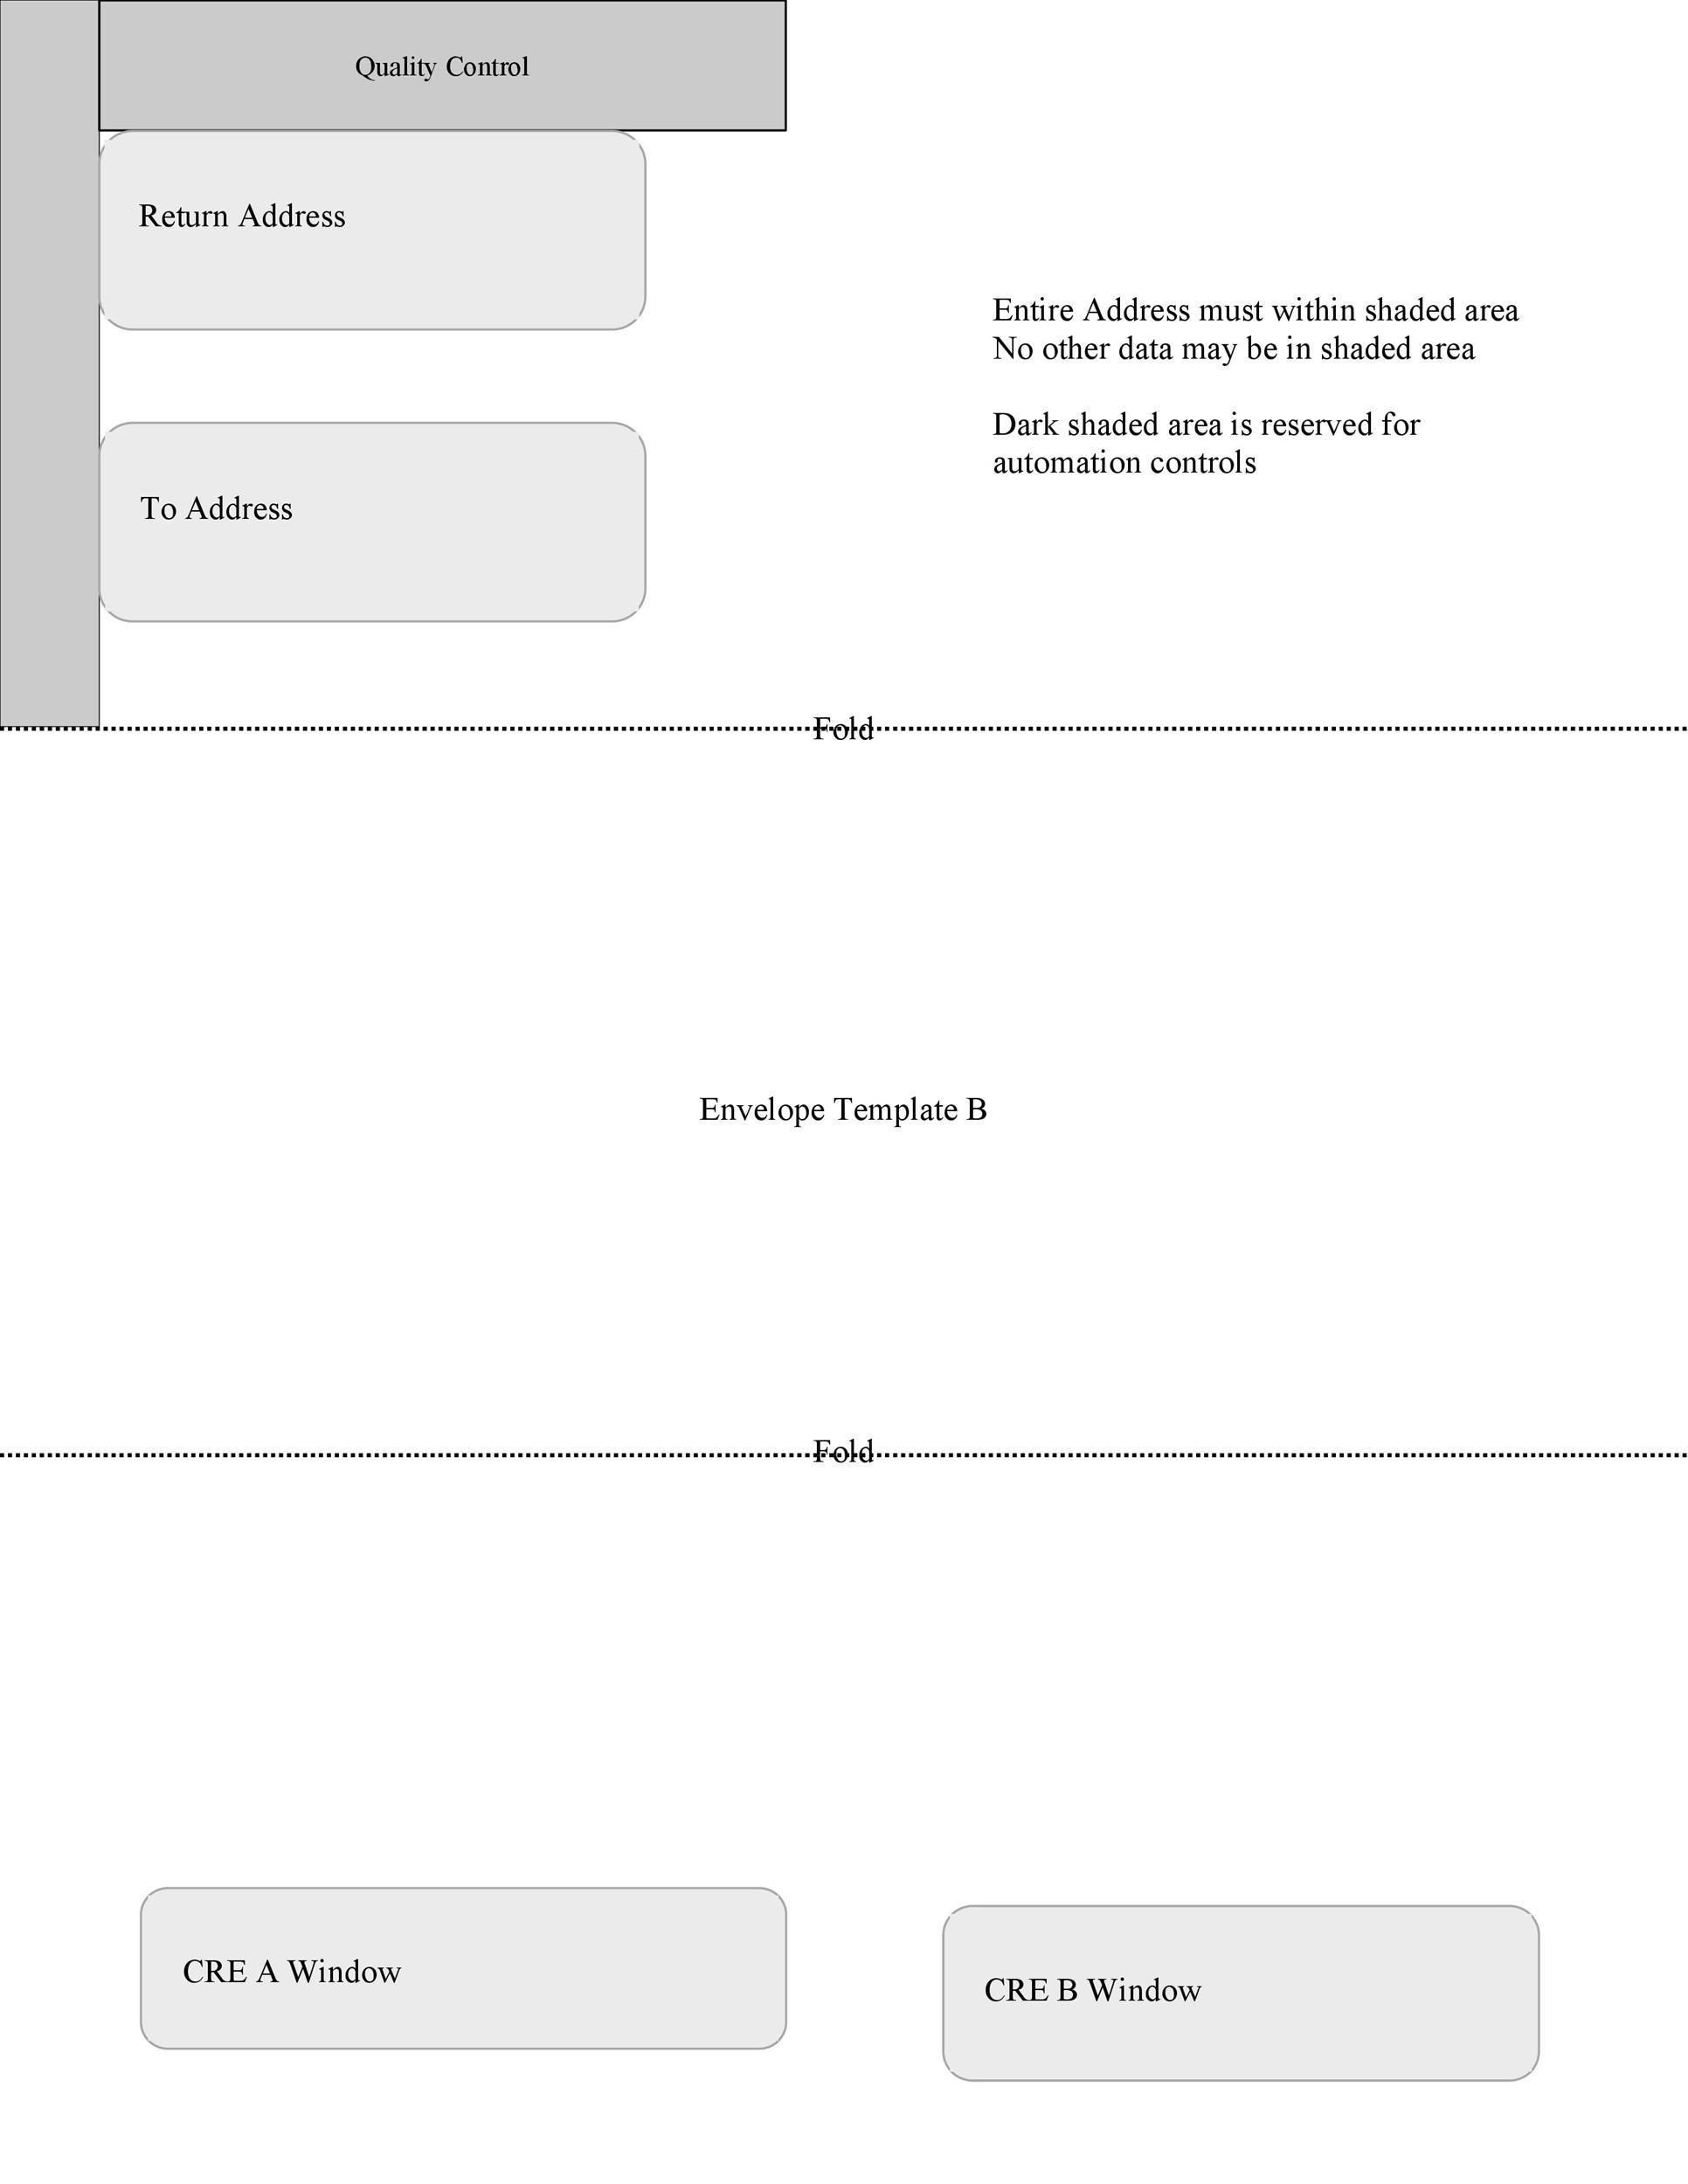 Return Address Template from templatelab.com